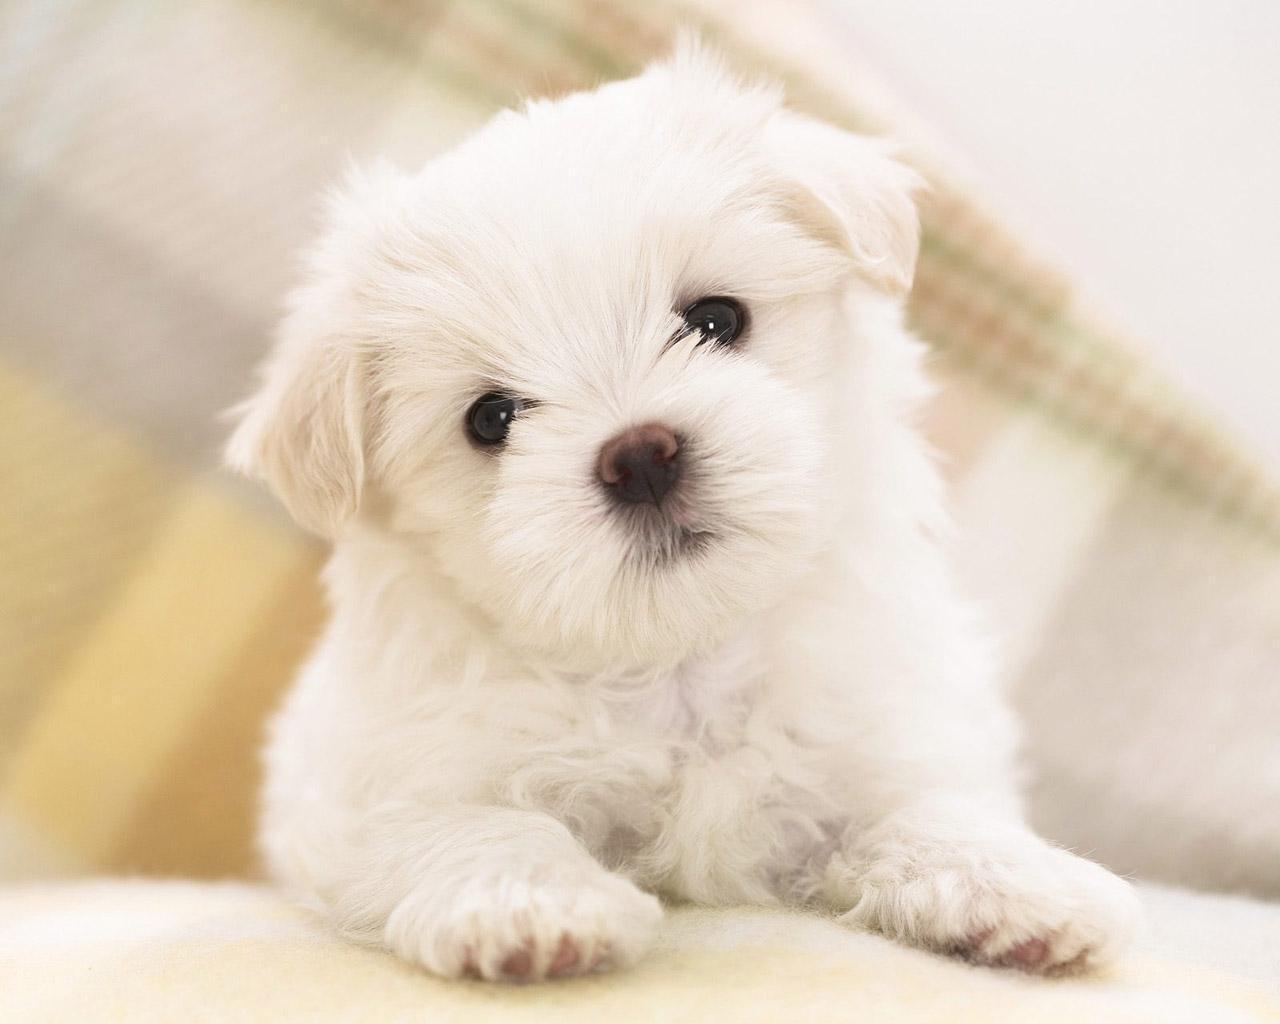 Cute Wallpaper - teddybear64 Wallpaper